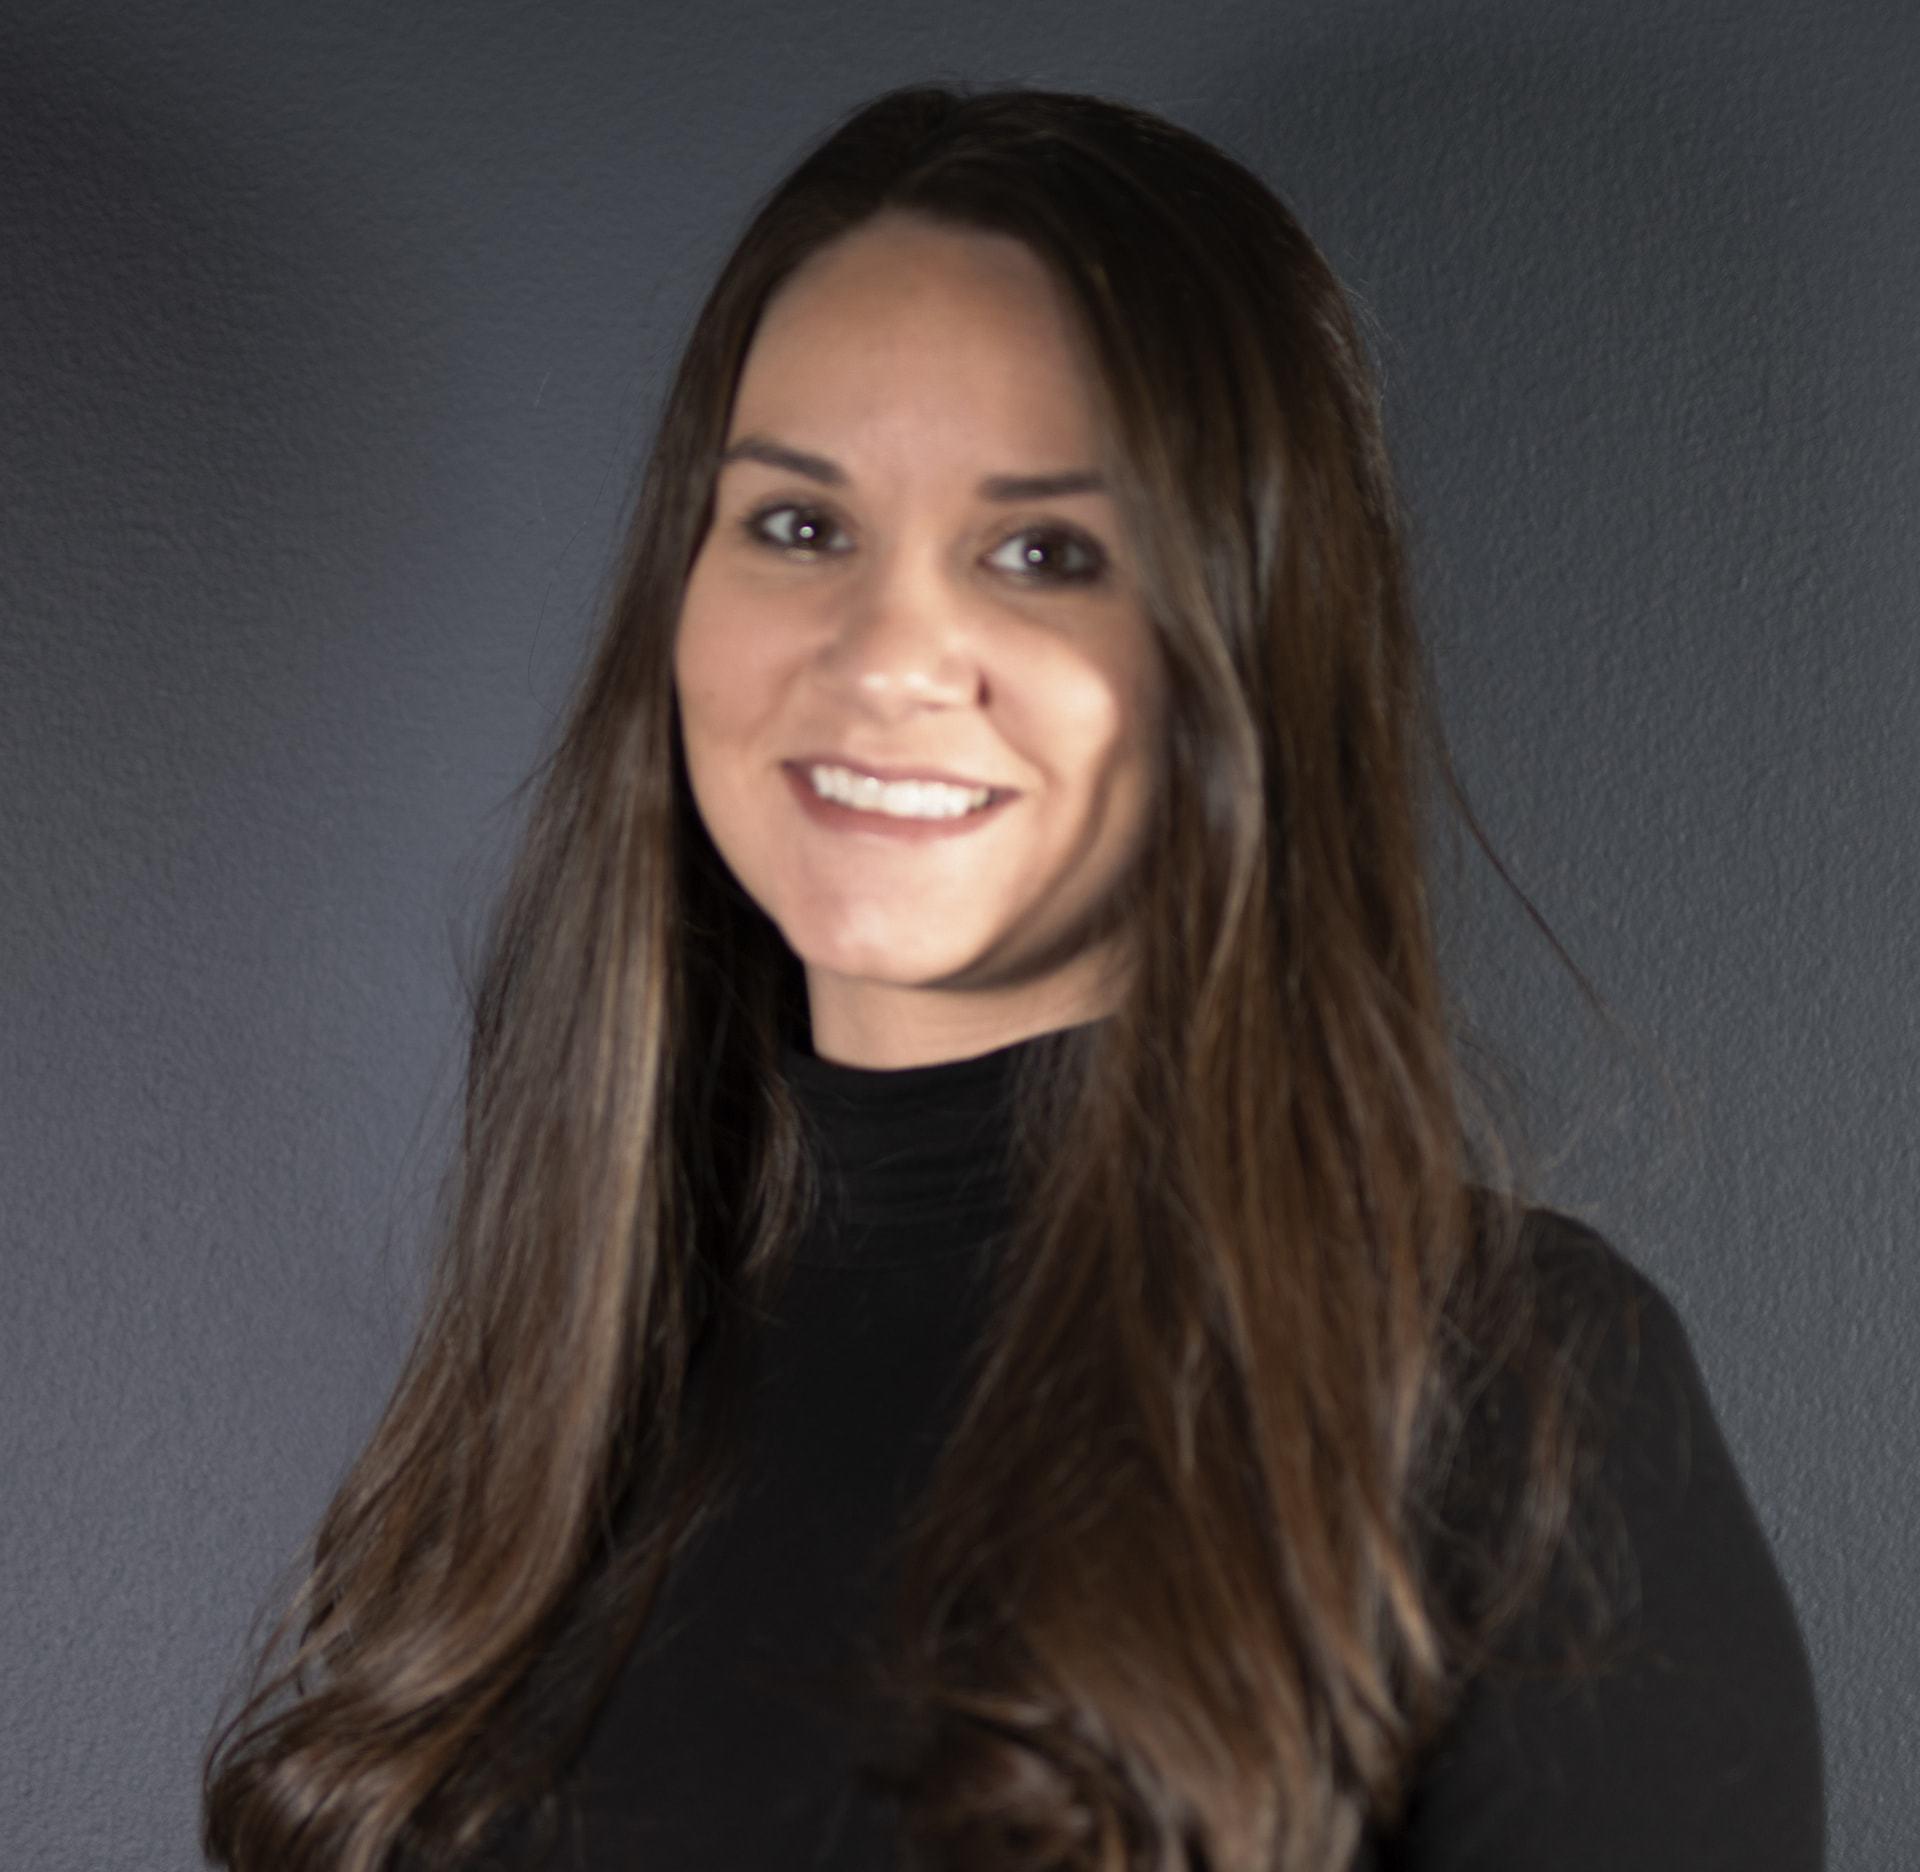 Kayla Seifert